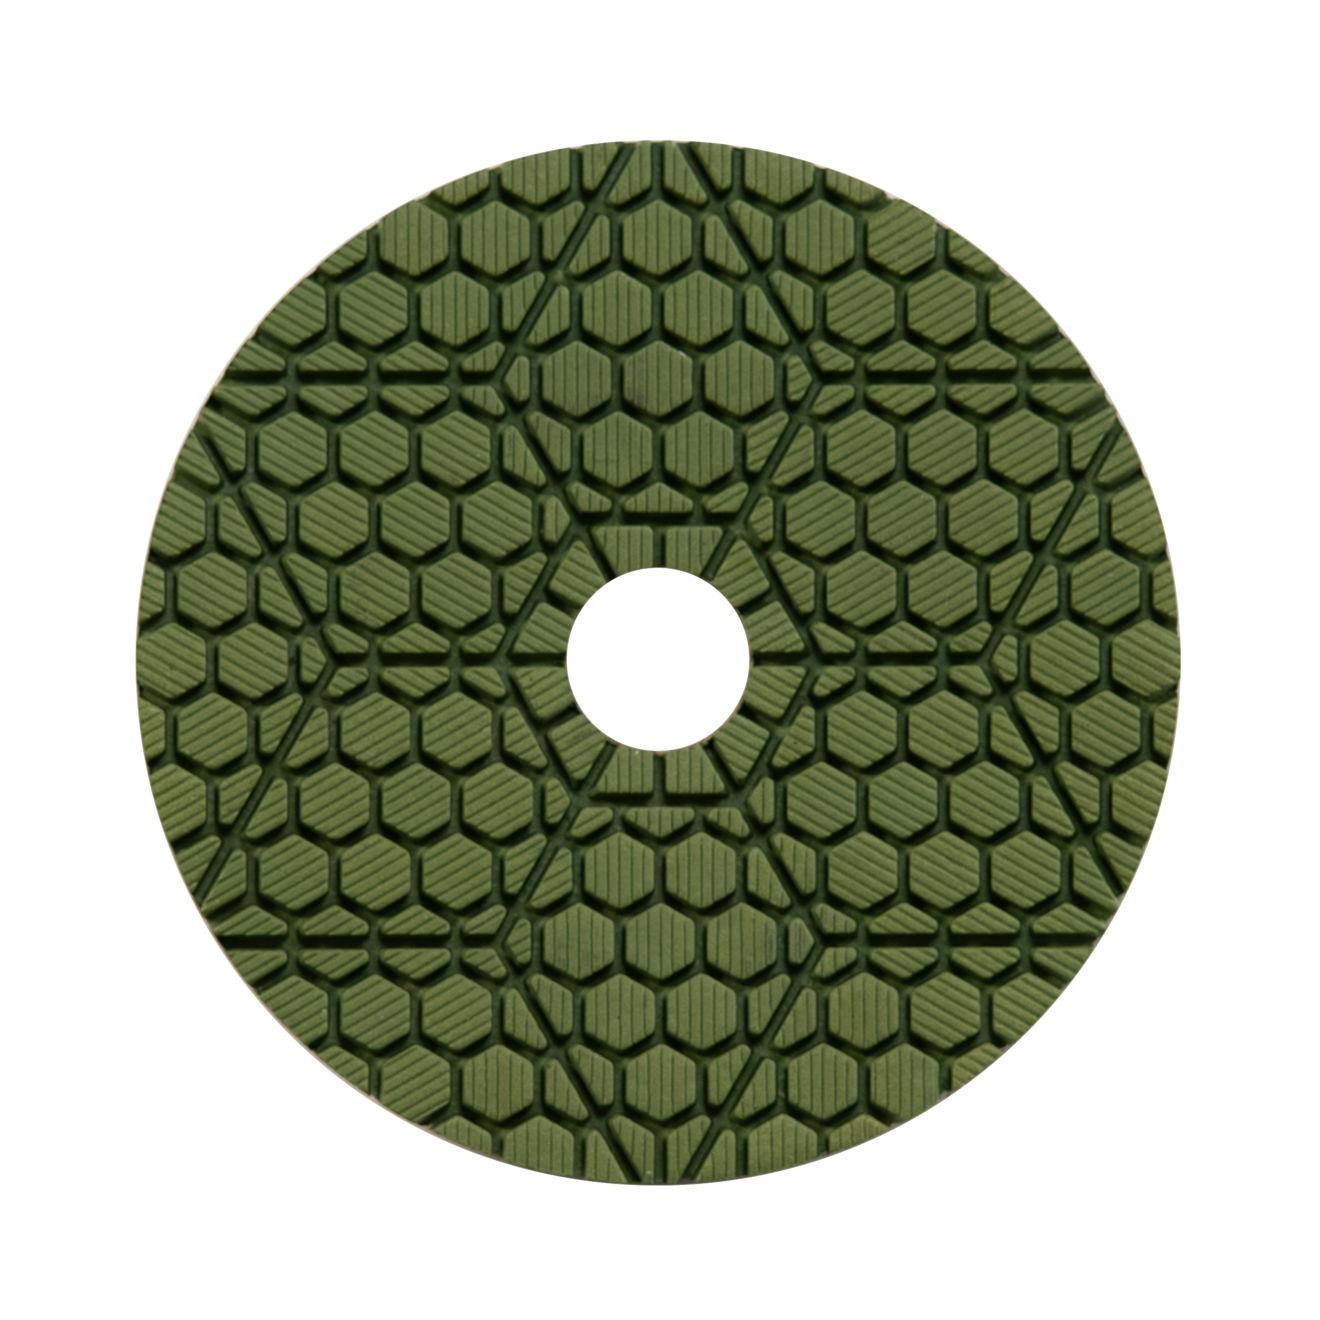 "ODYN Premium Wet Stone Polishing Pad 4"" x 5/8"" - 3000 Grit"